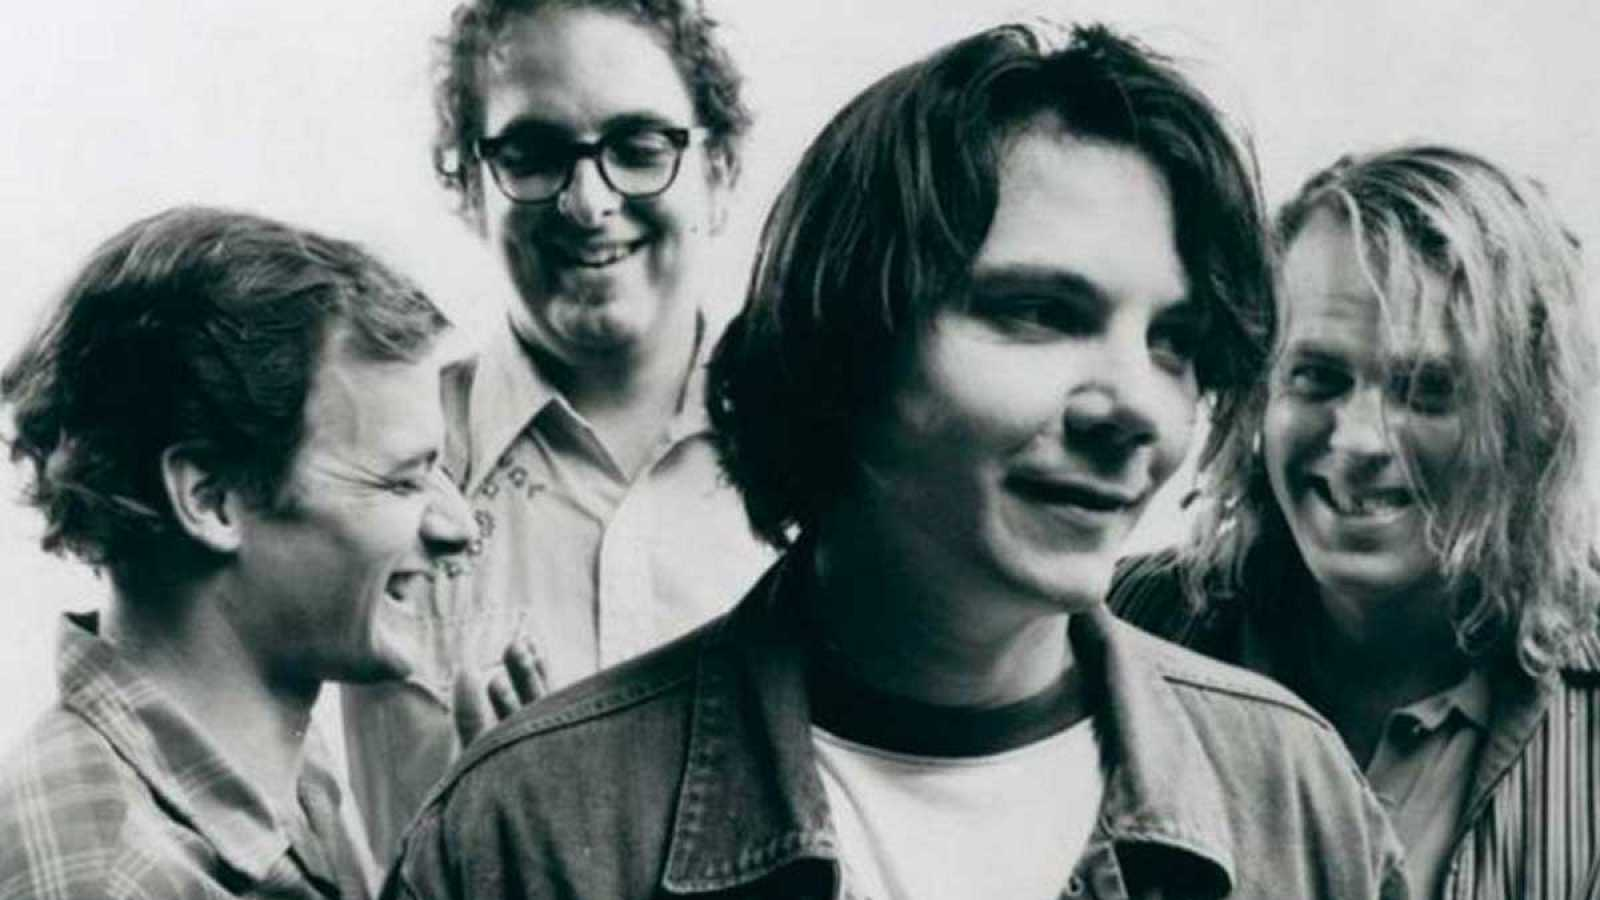 Na Na Na - The War on Drugs y Wilco en directo - 10/11/20 - escuchar ahora